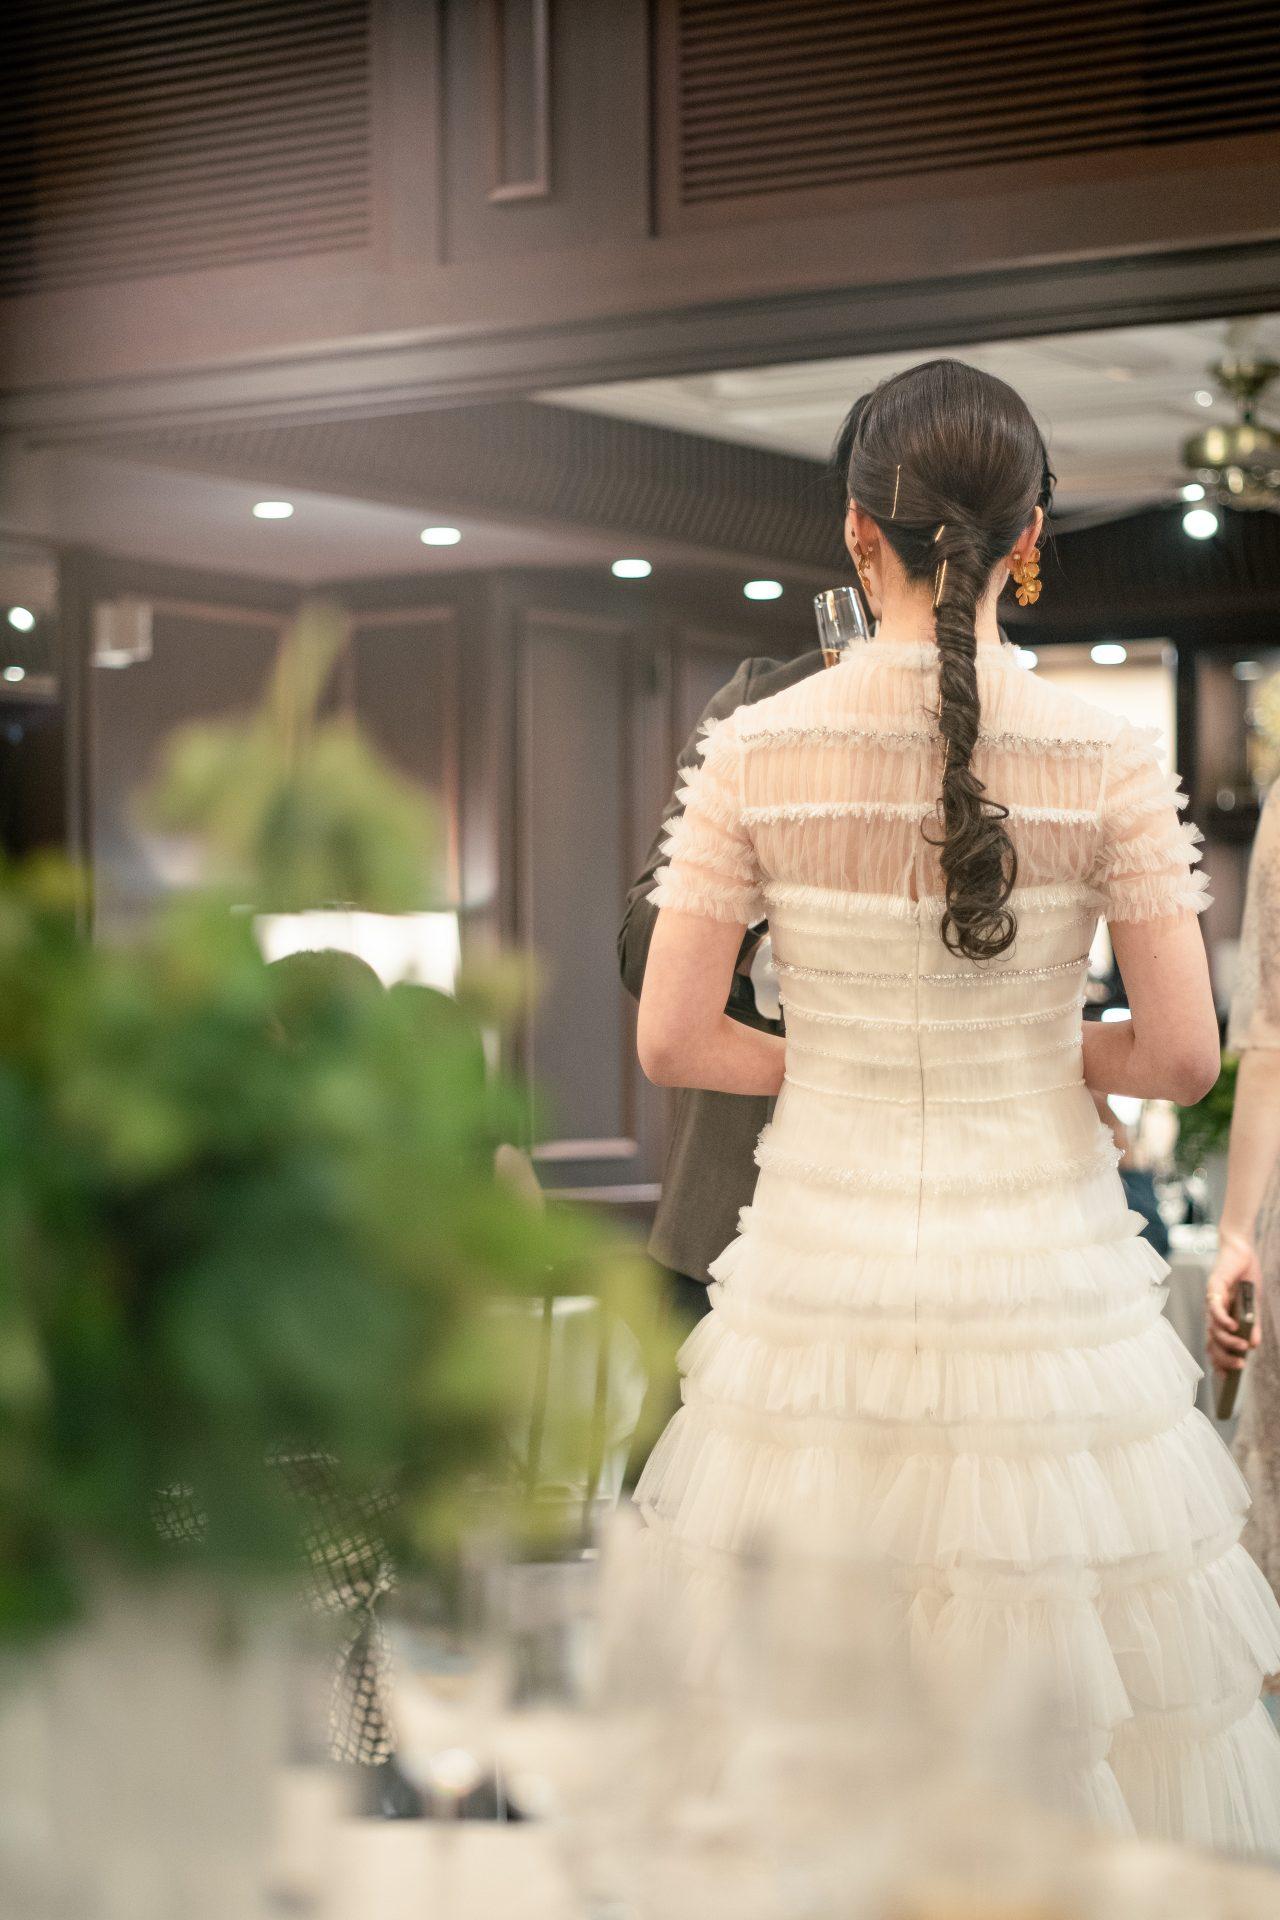 THE TREAT DRESSING京都店にてお取り扱いがある